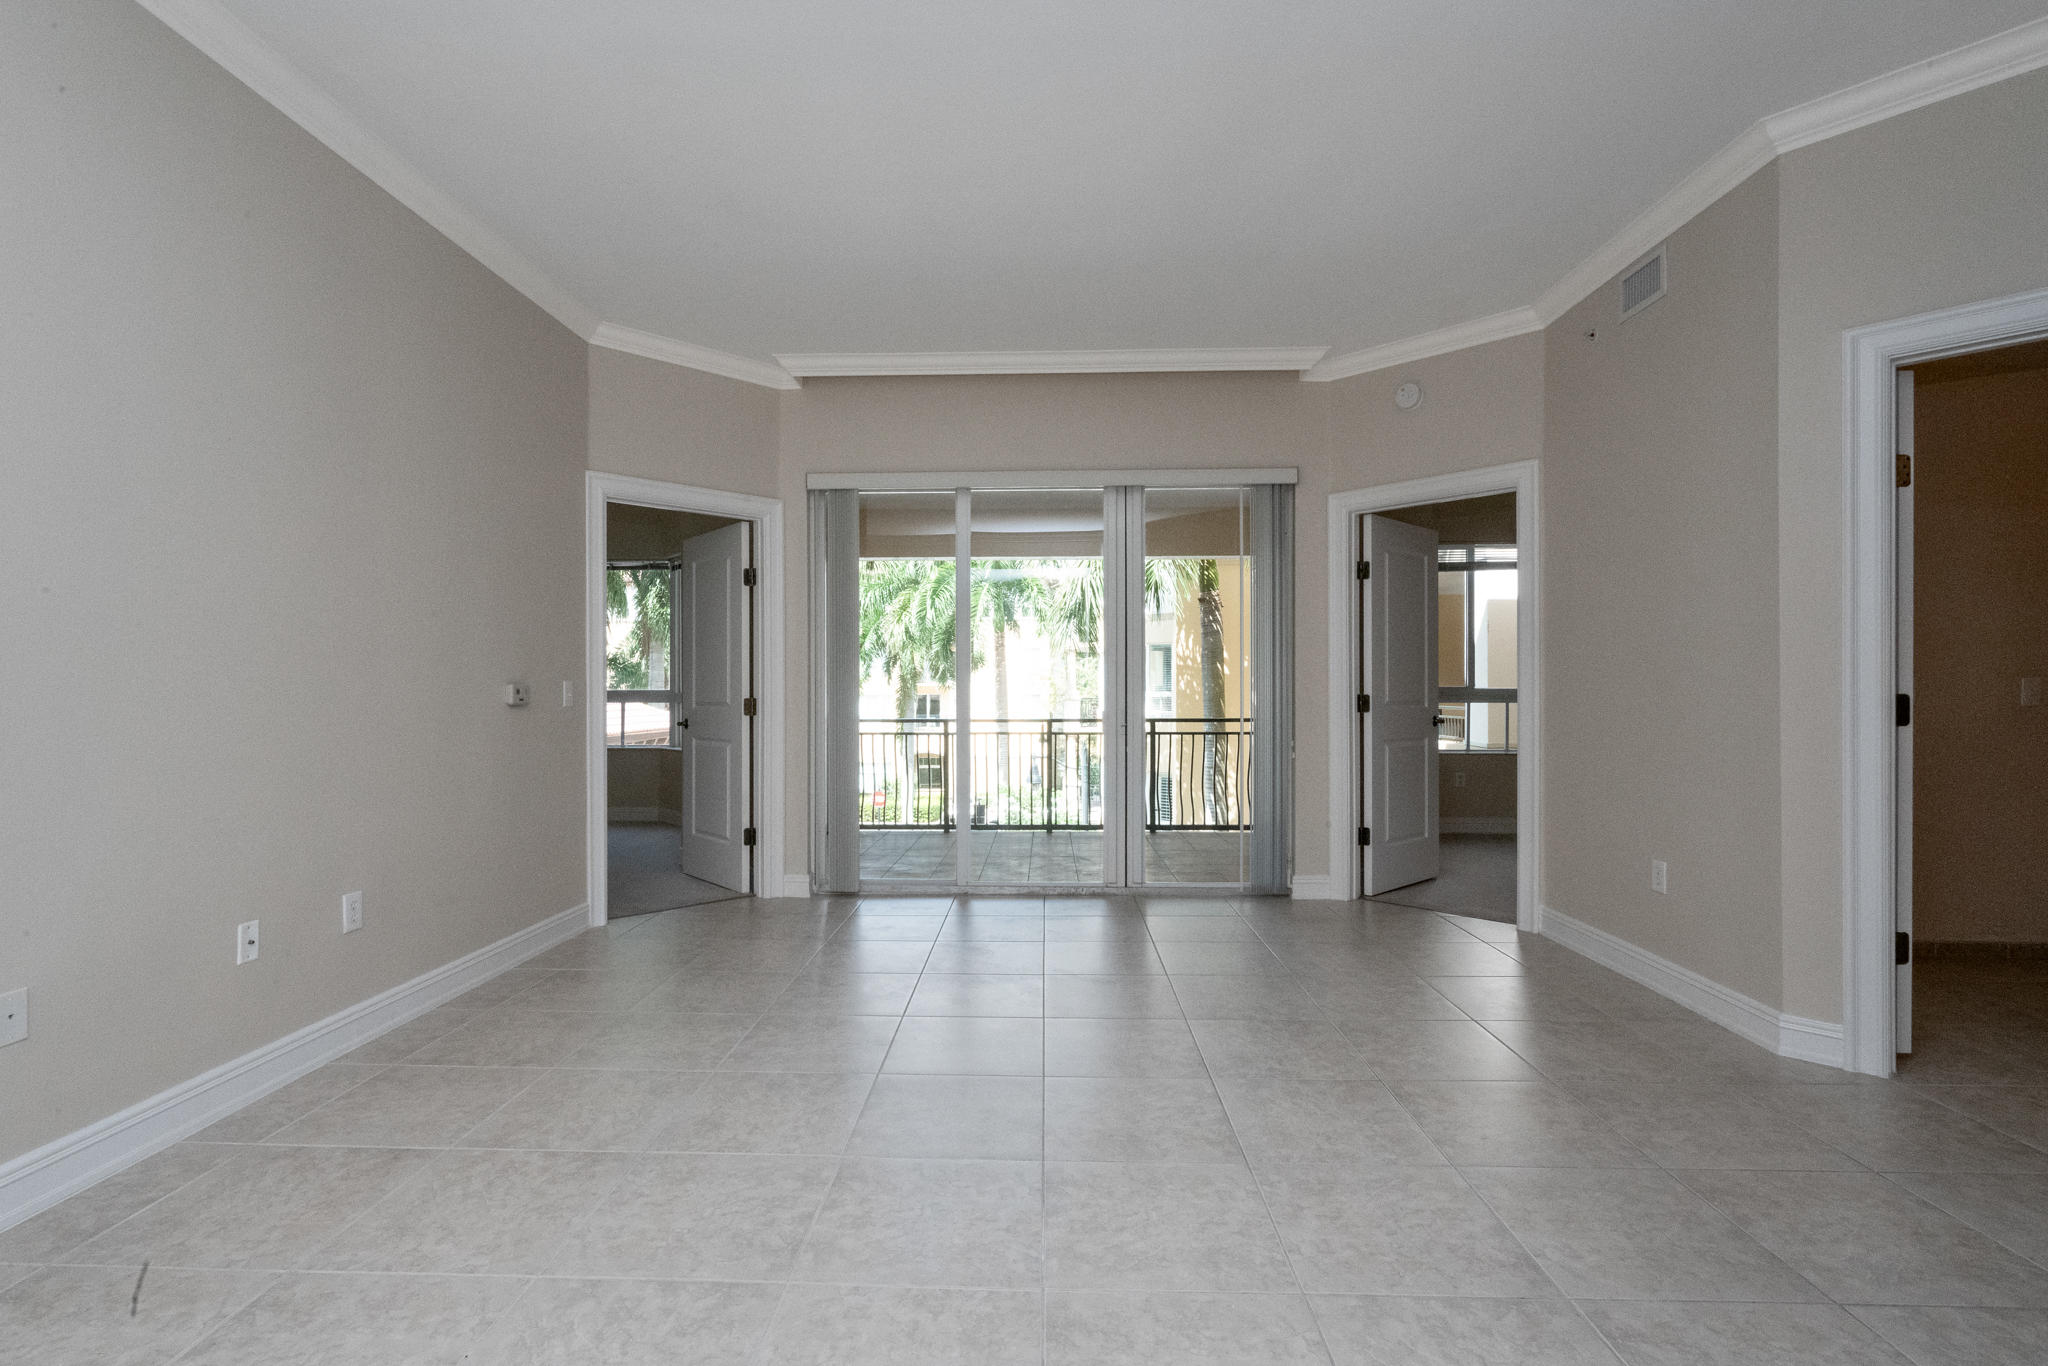 Image 19 For 16100 Emerald Estates Drive 390